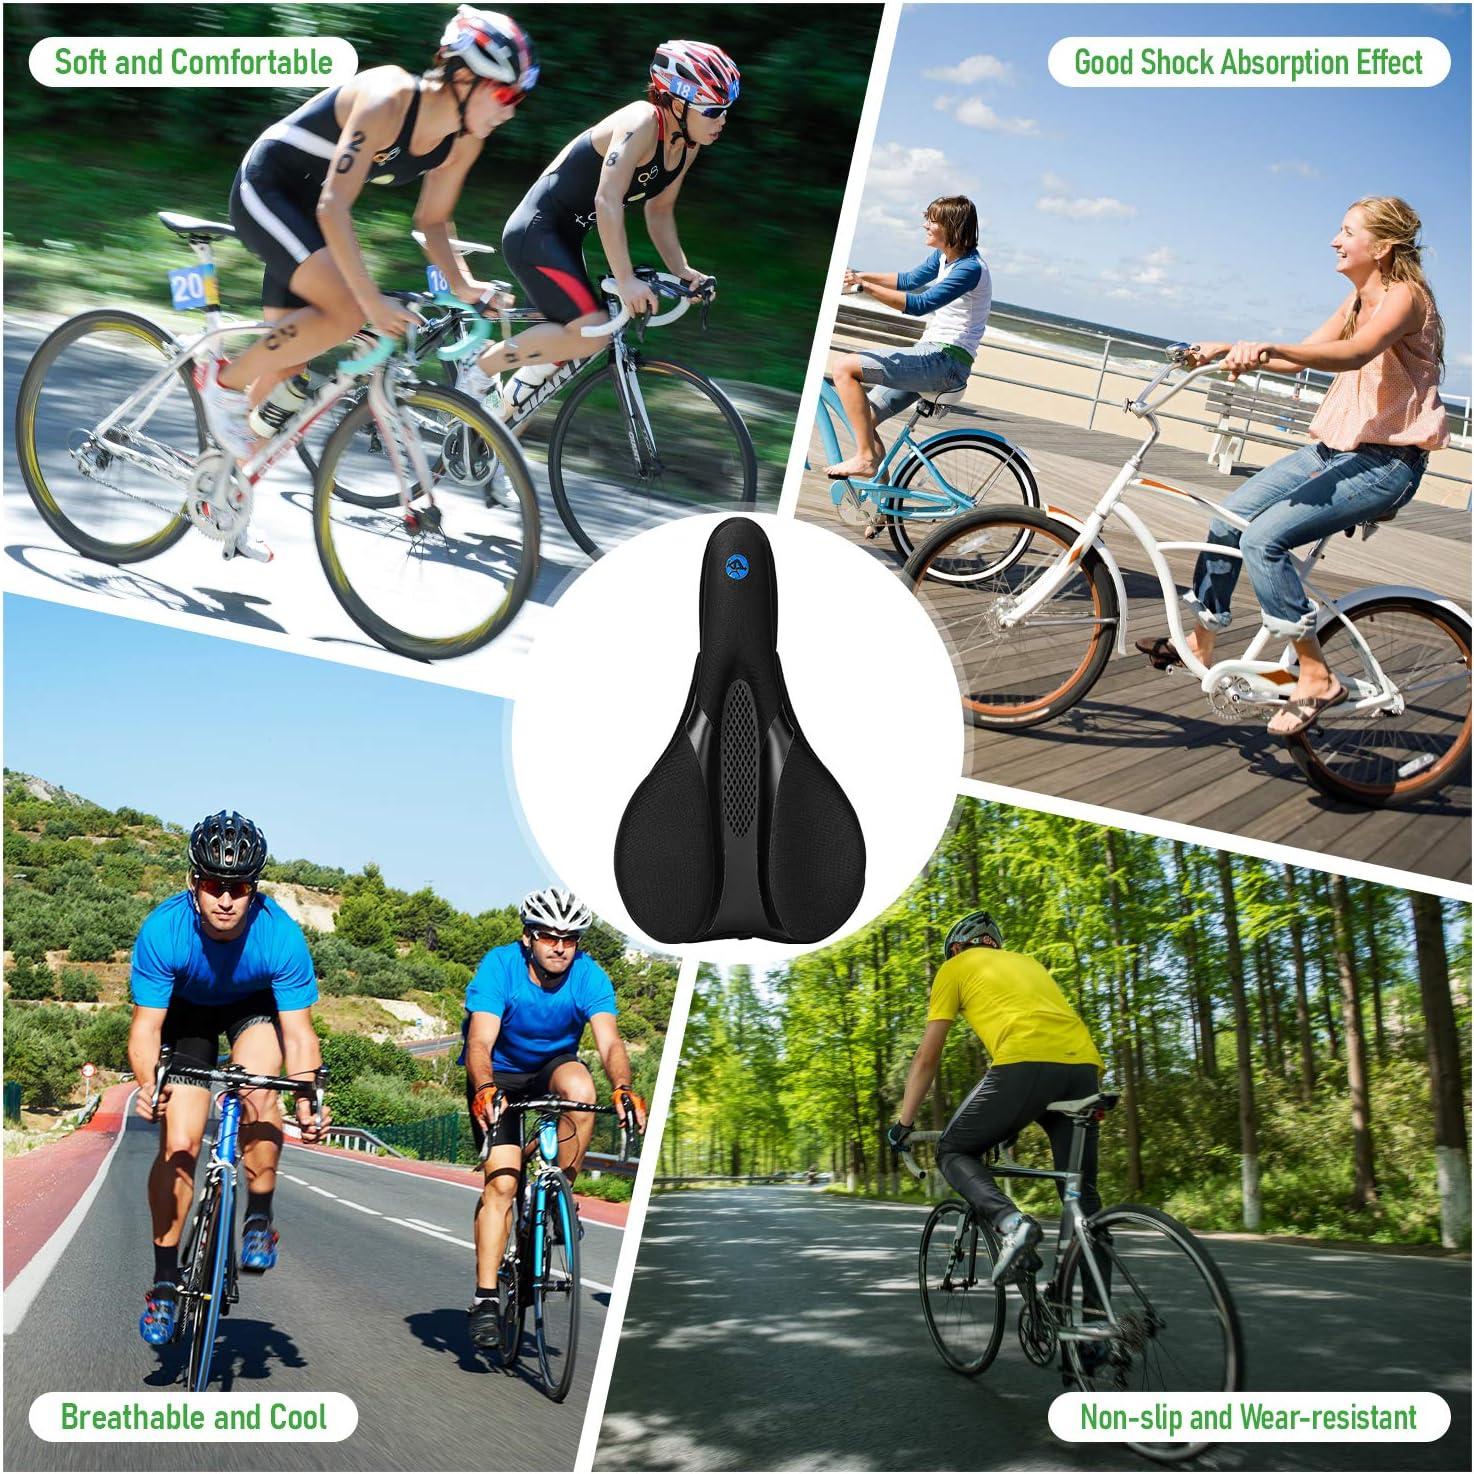 28cm x 17.5cm Faneam Cubierta de Asiento de Bicicleta,Transpirable Cubre-sillines de Asiento de MTB Bicicleta,Cubierta de Asiento de Bicicleta con Efecto Amortiguador,Velcro Ajustable Negro